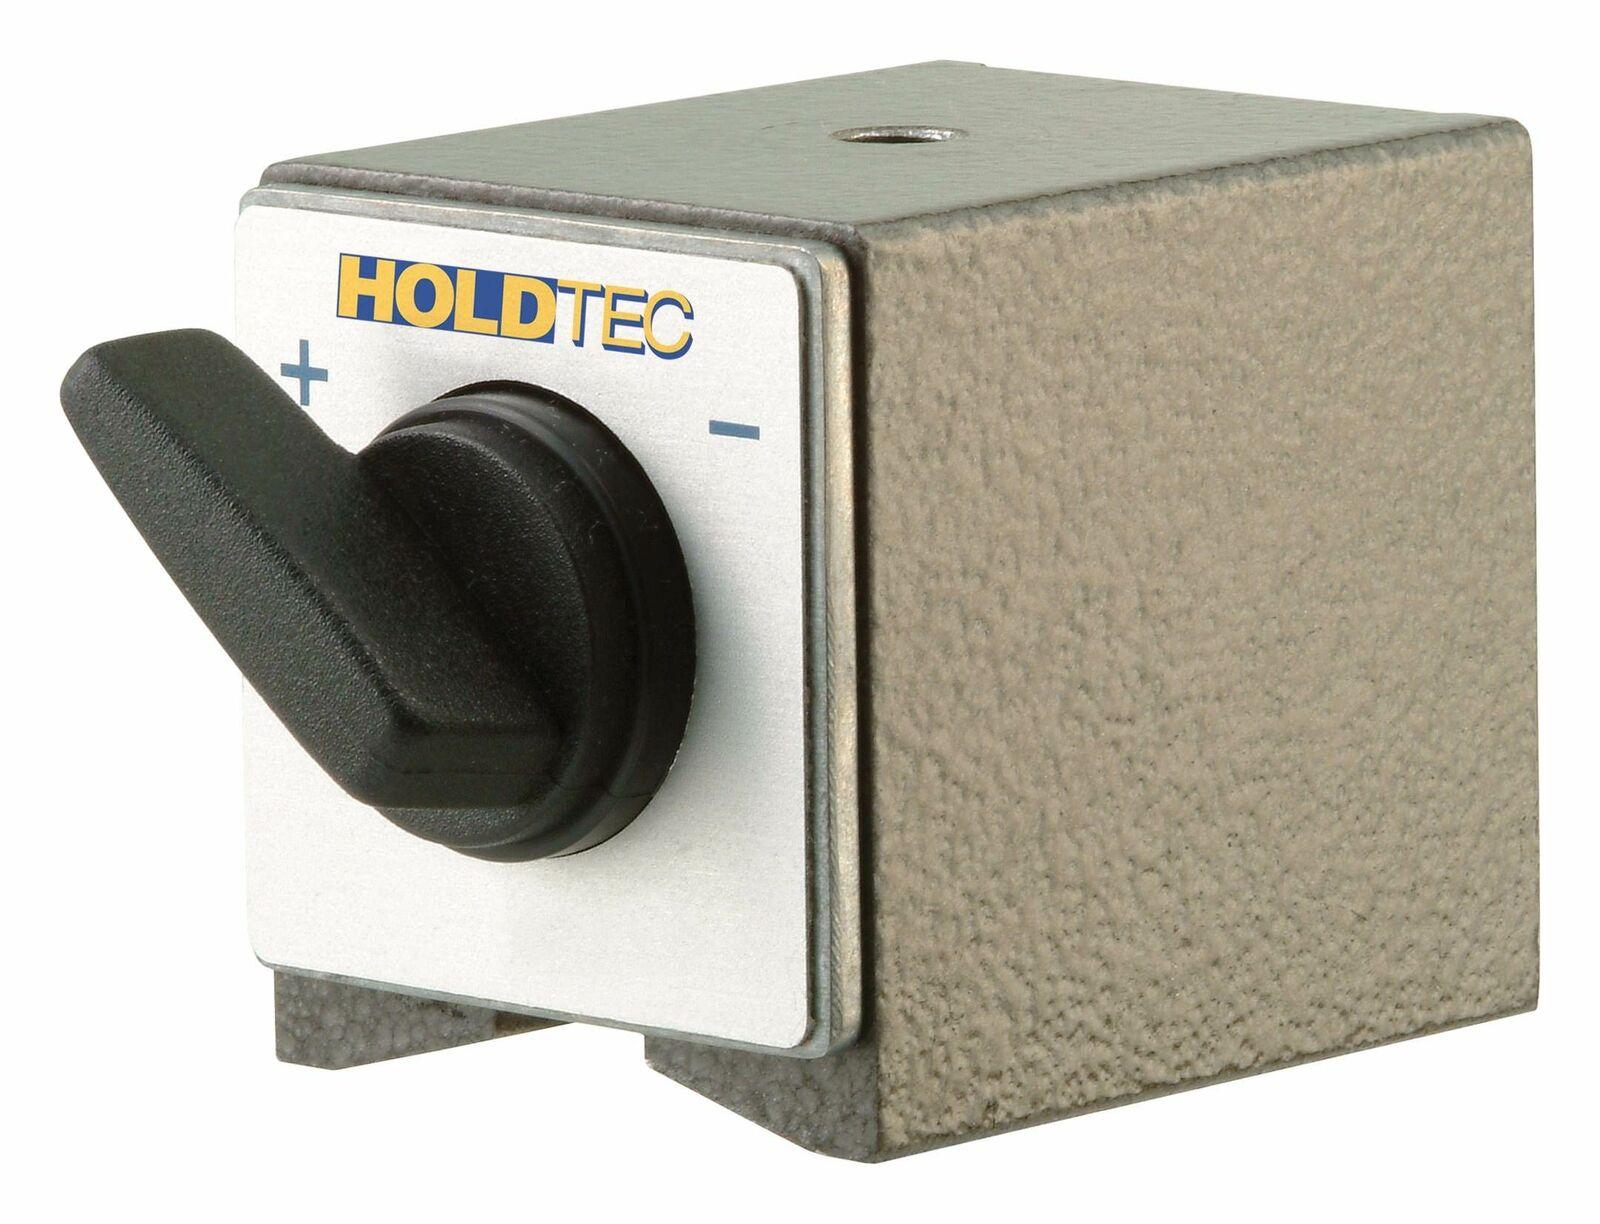 IBT Ersatz Magnetfuss 1000N M6-8-10-12-10x1,25 - DG1003HT